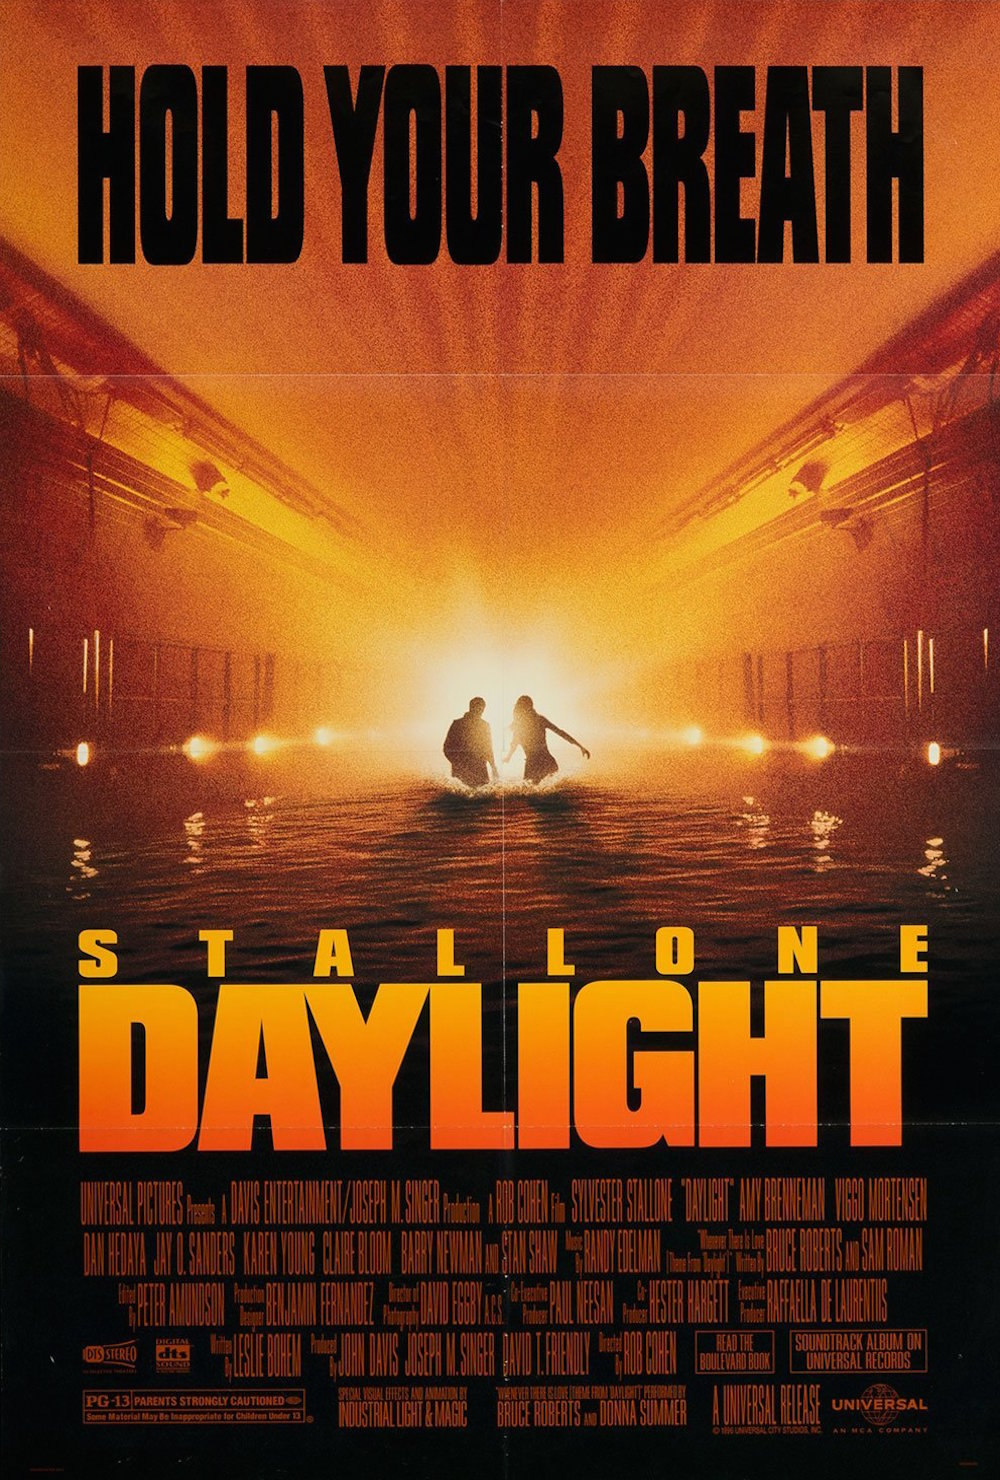 Daylight 1996 Sylvester Stallone